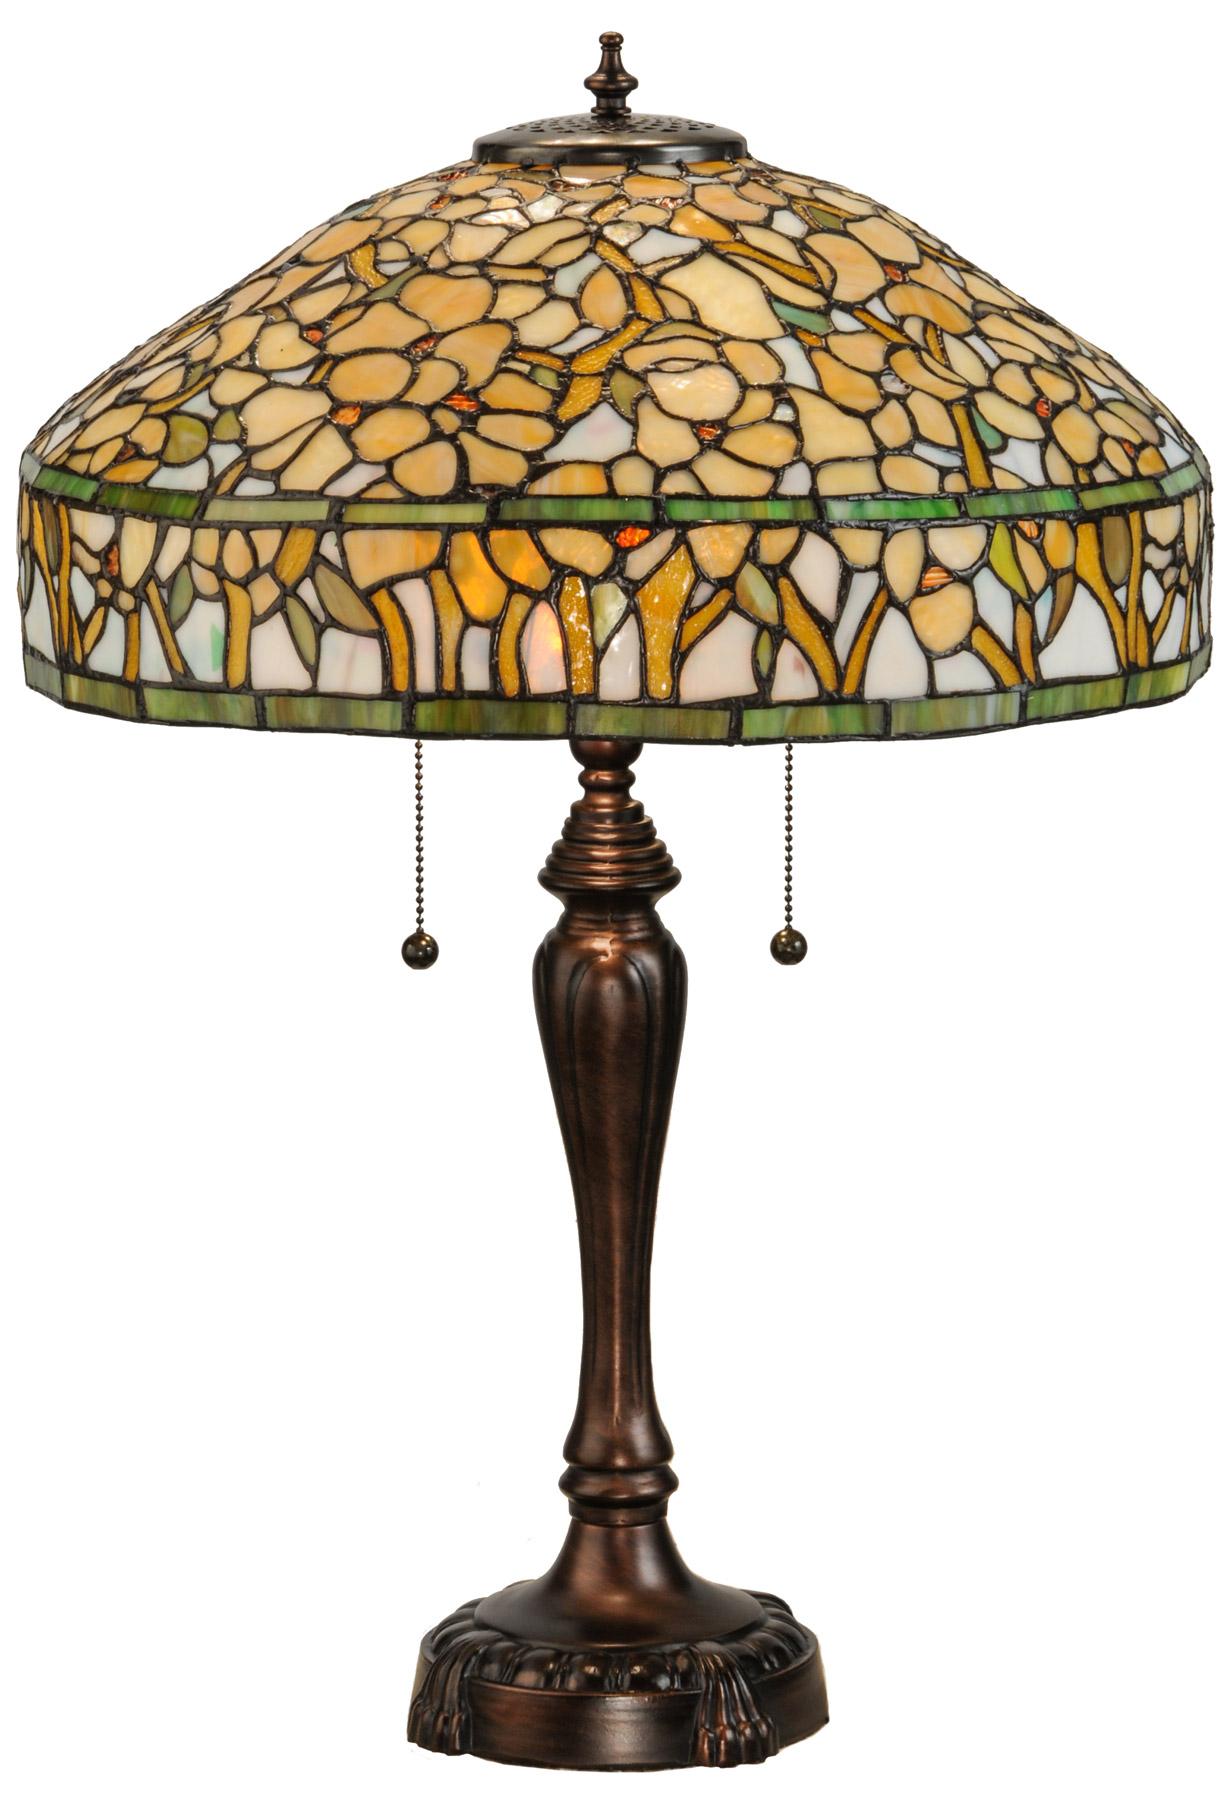 28 meyda lamps meyda tiffany rosebush accent lamp